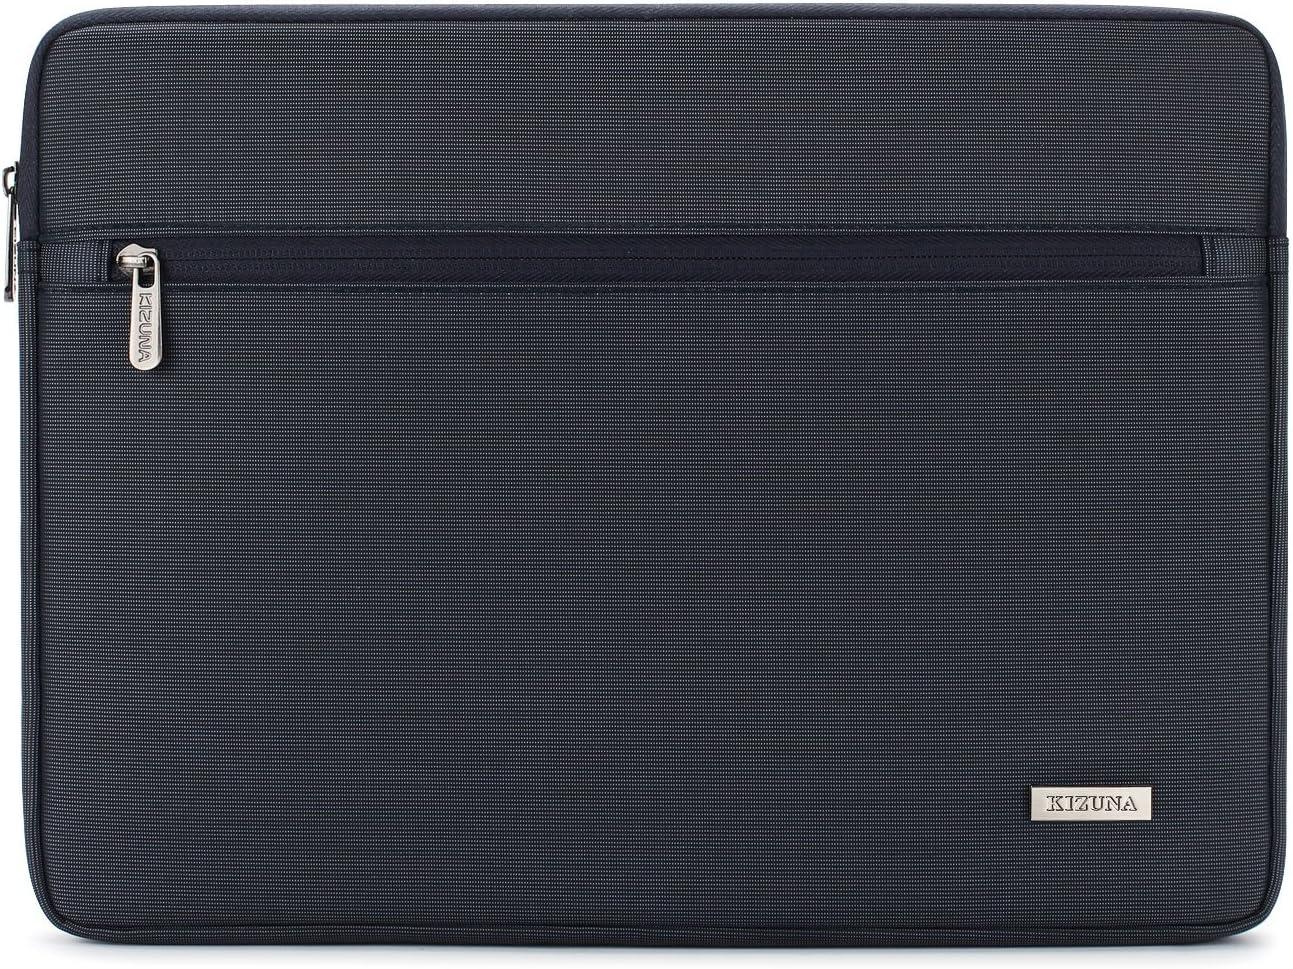 "KIZUNA 12.5-13 Inch Laptop Sleeve Computer Case Water Resistant Bag for 13.3"" MacBook Air 2020/Lenovo Yoga 730 720 C940/13.9"" Huawei MateBook X Pro/MateBook 14/Surface Laptop 3/Asus ZenBook/Dell,Navy"